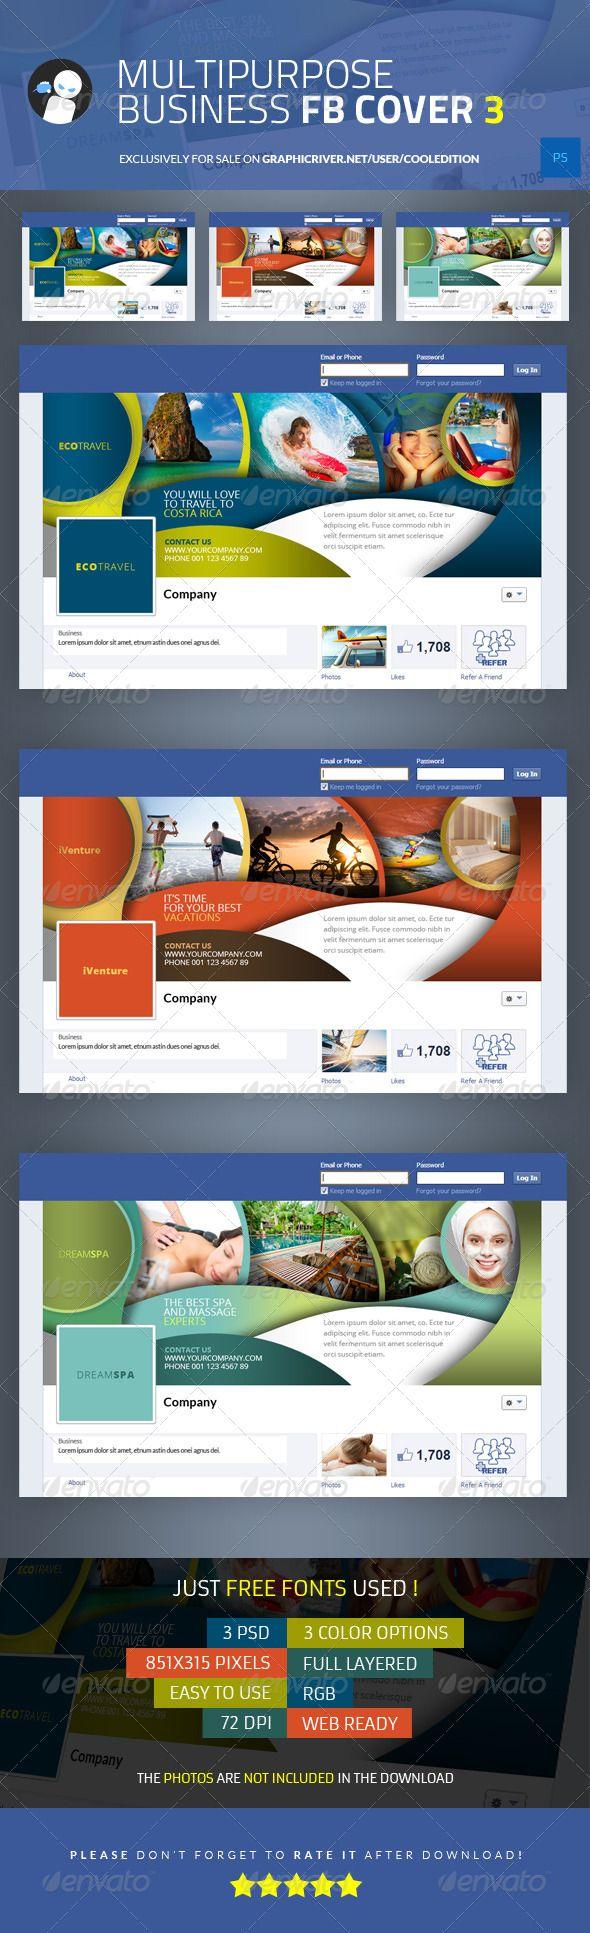 Multipurpose Business Facebook Cover 3 - $2